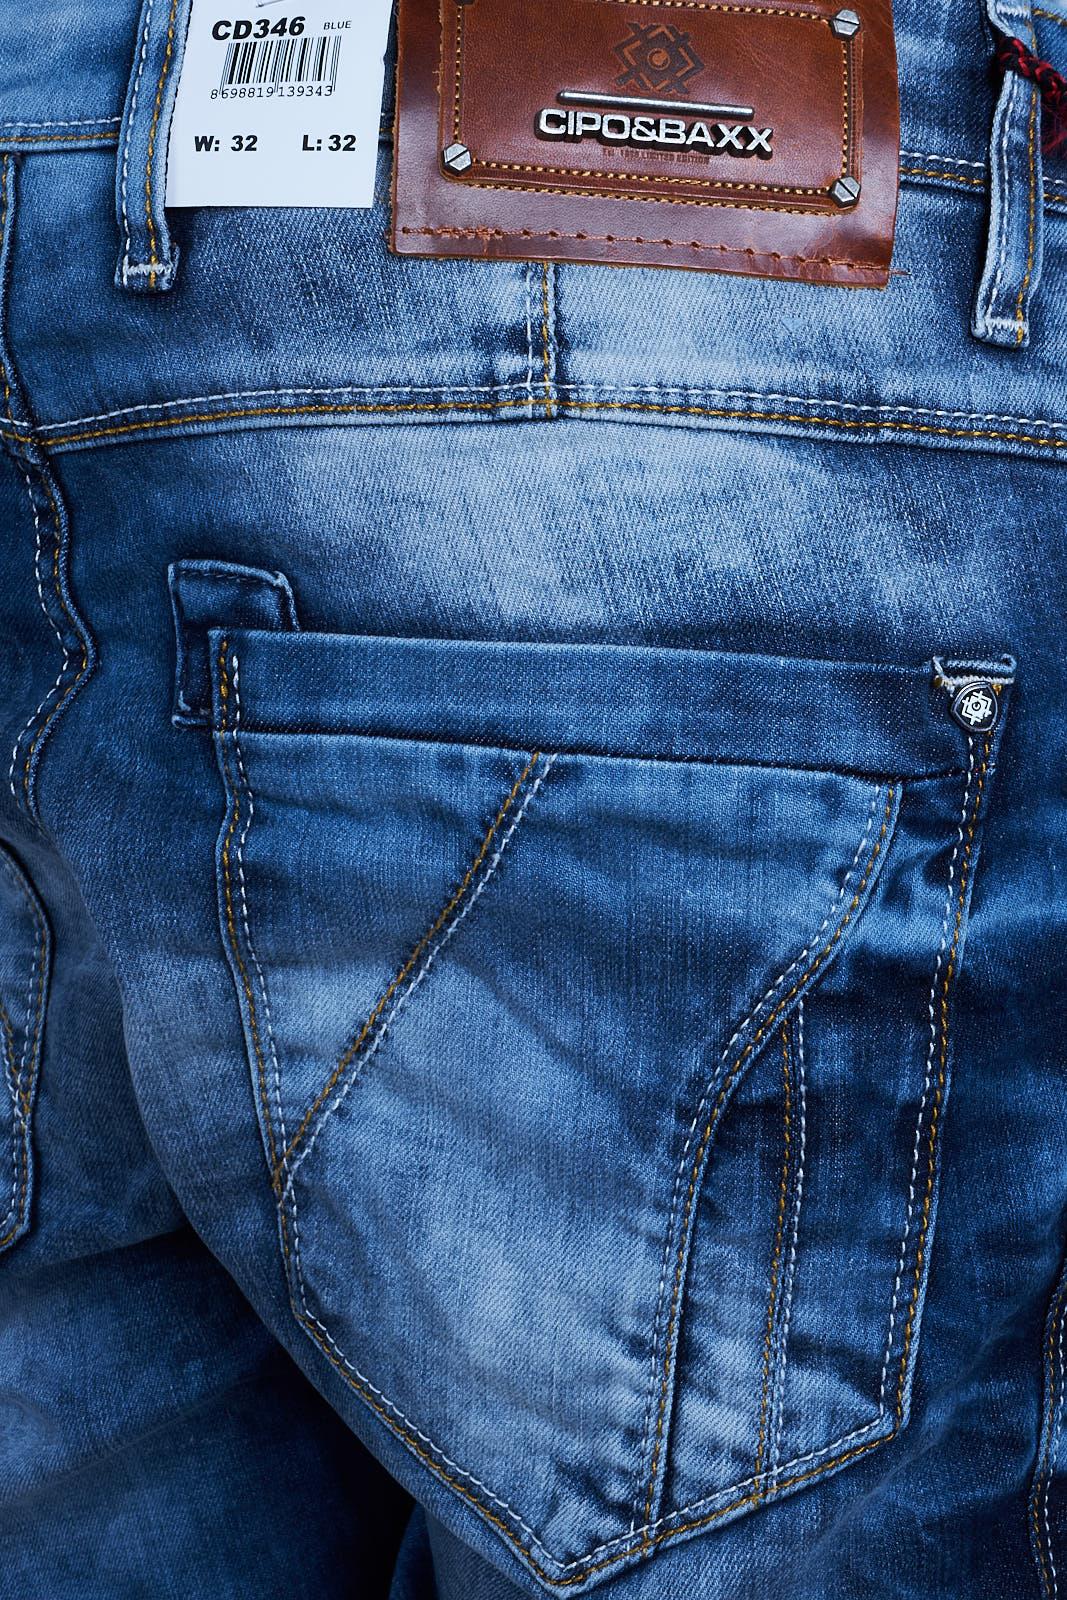 cipo baxx herren jeans clubwear denim hose cd346. Black Bedroom Furniture Sets. Home Design Ideas